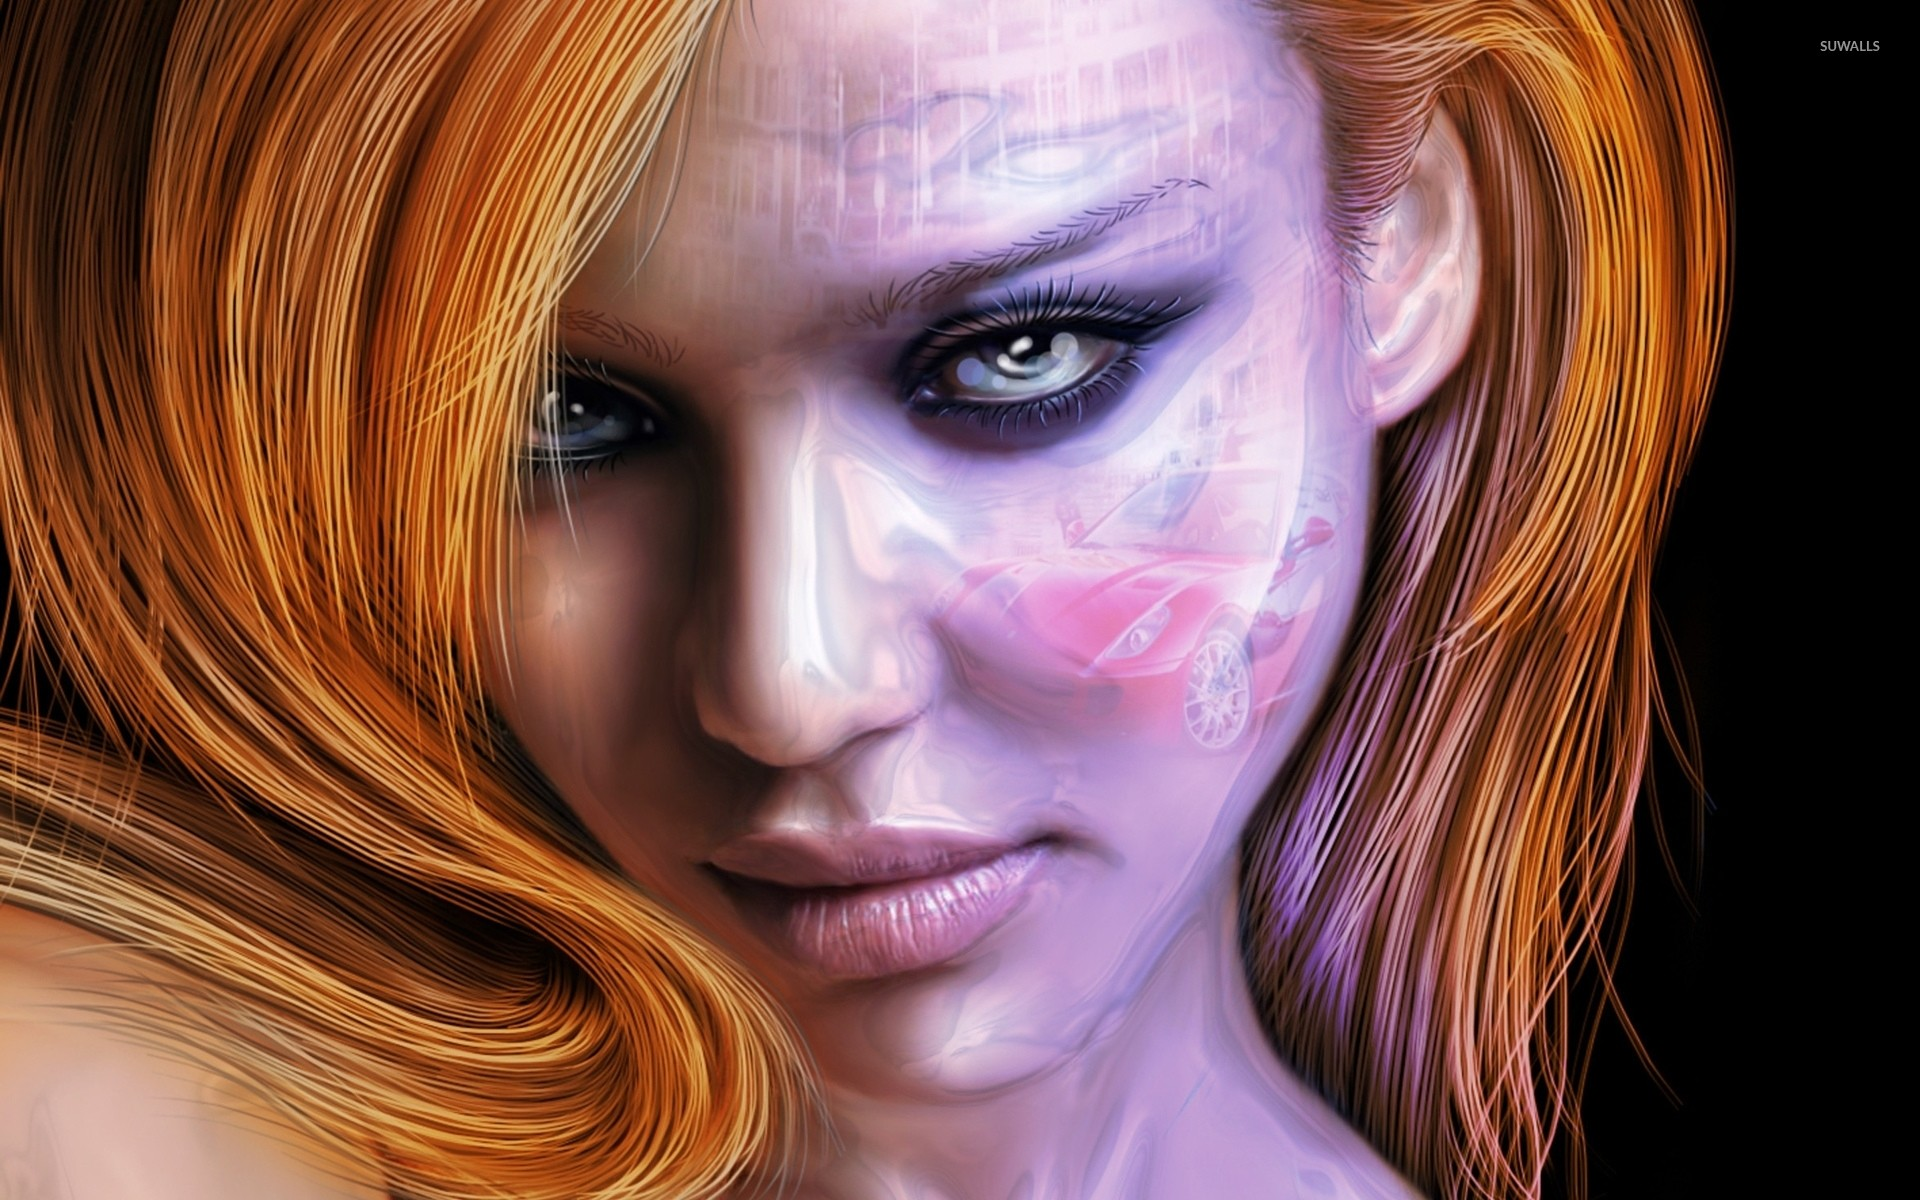 Redhead beauty wallpaper jpg